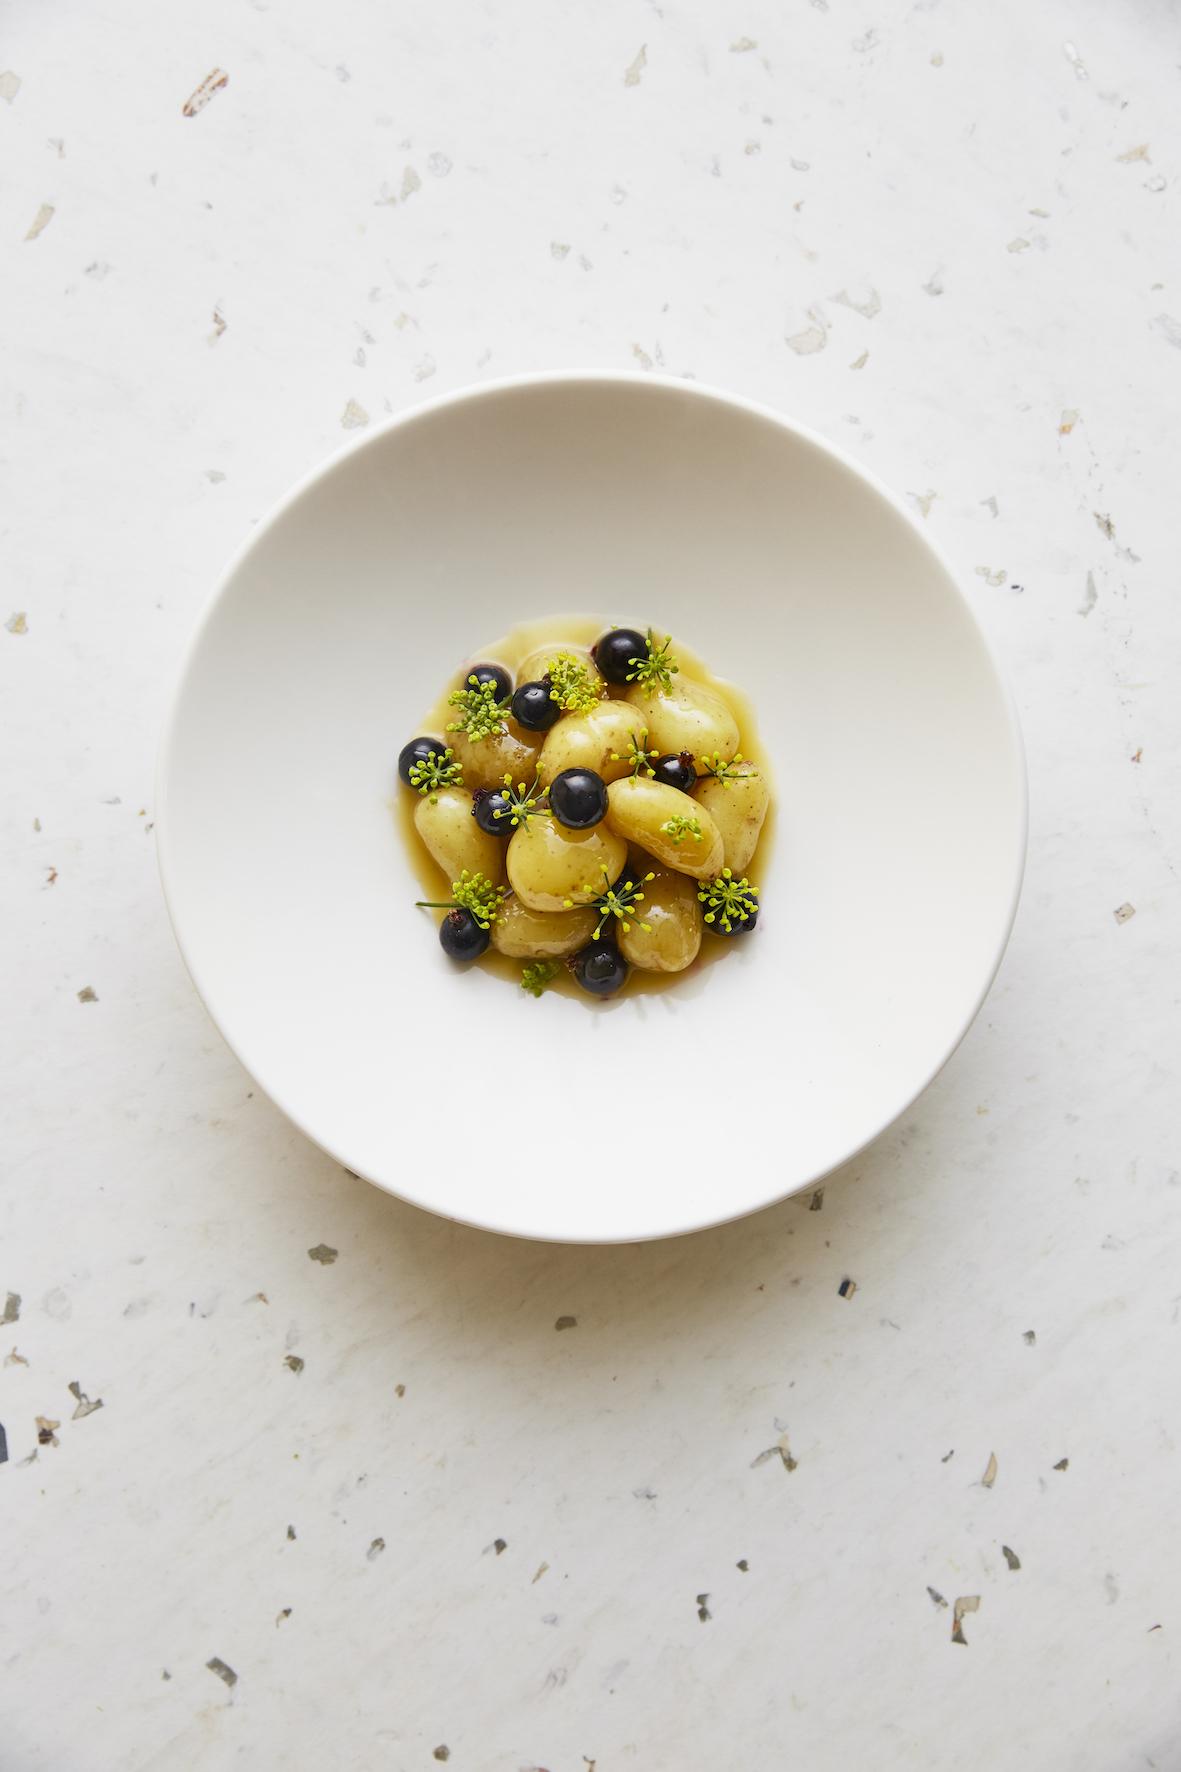 Cub, London N1: Restaurant Review - olive magazine